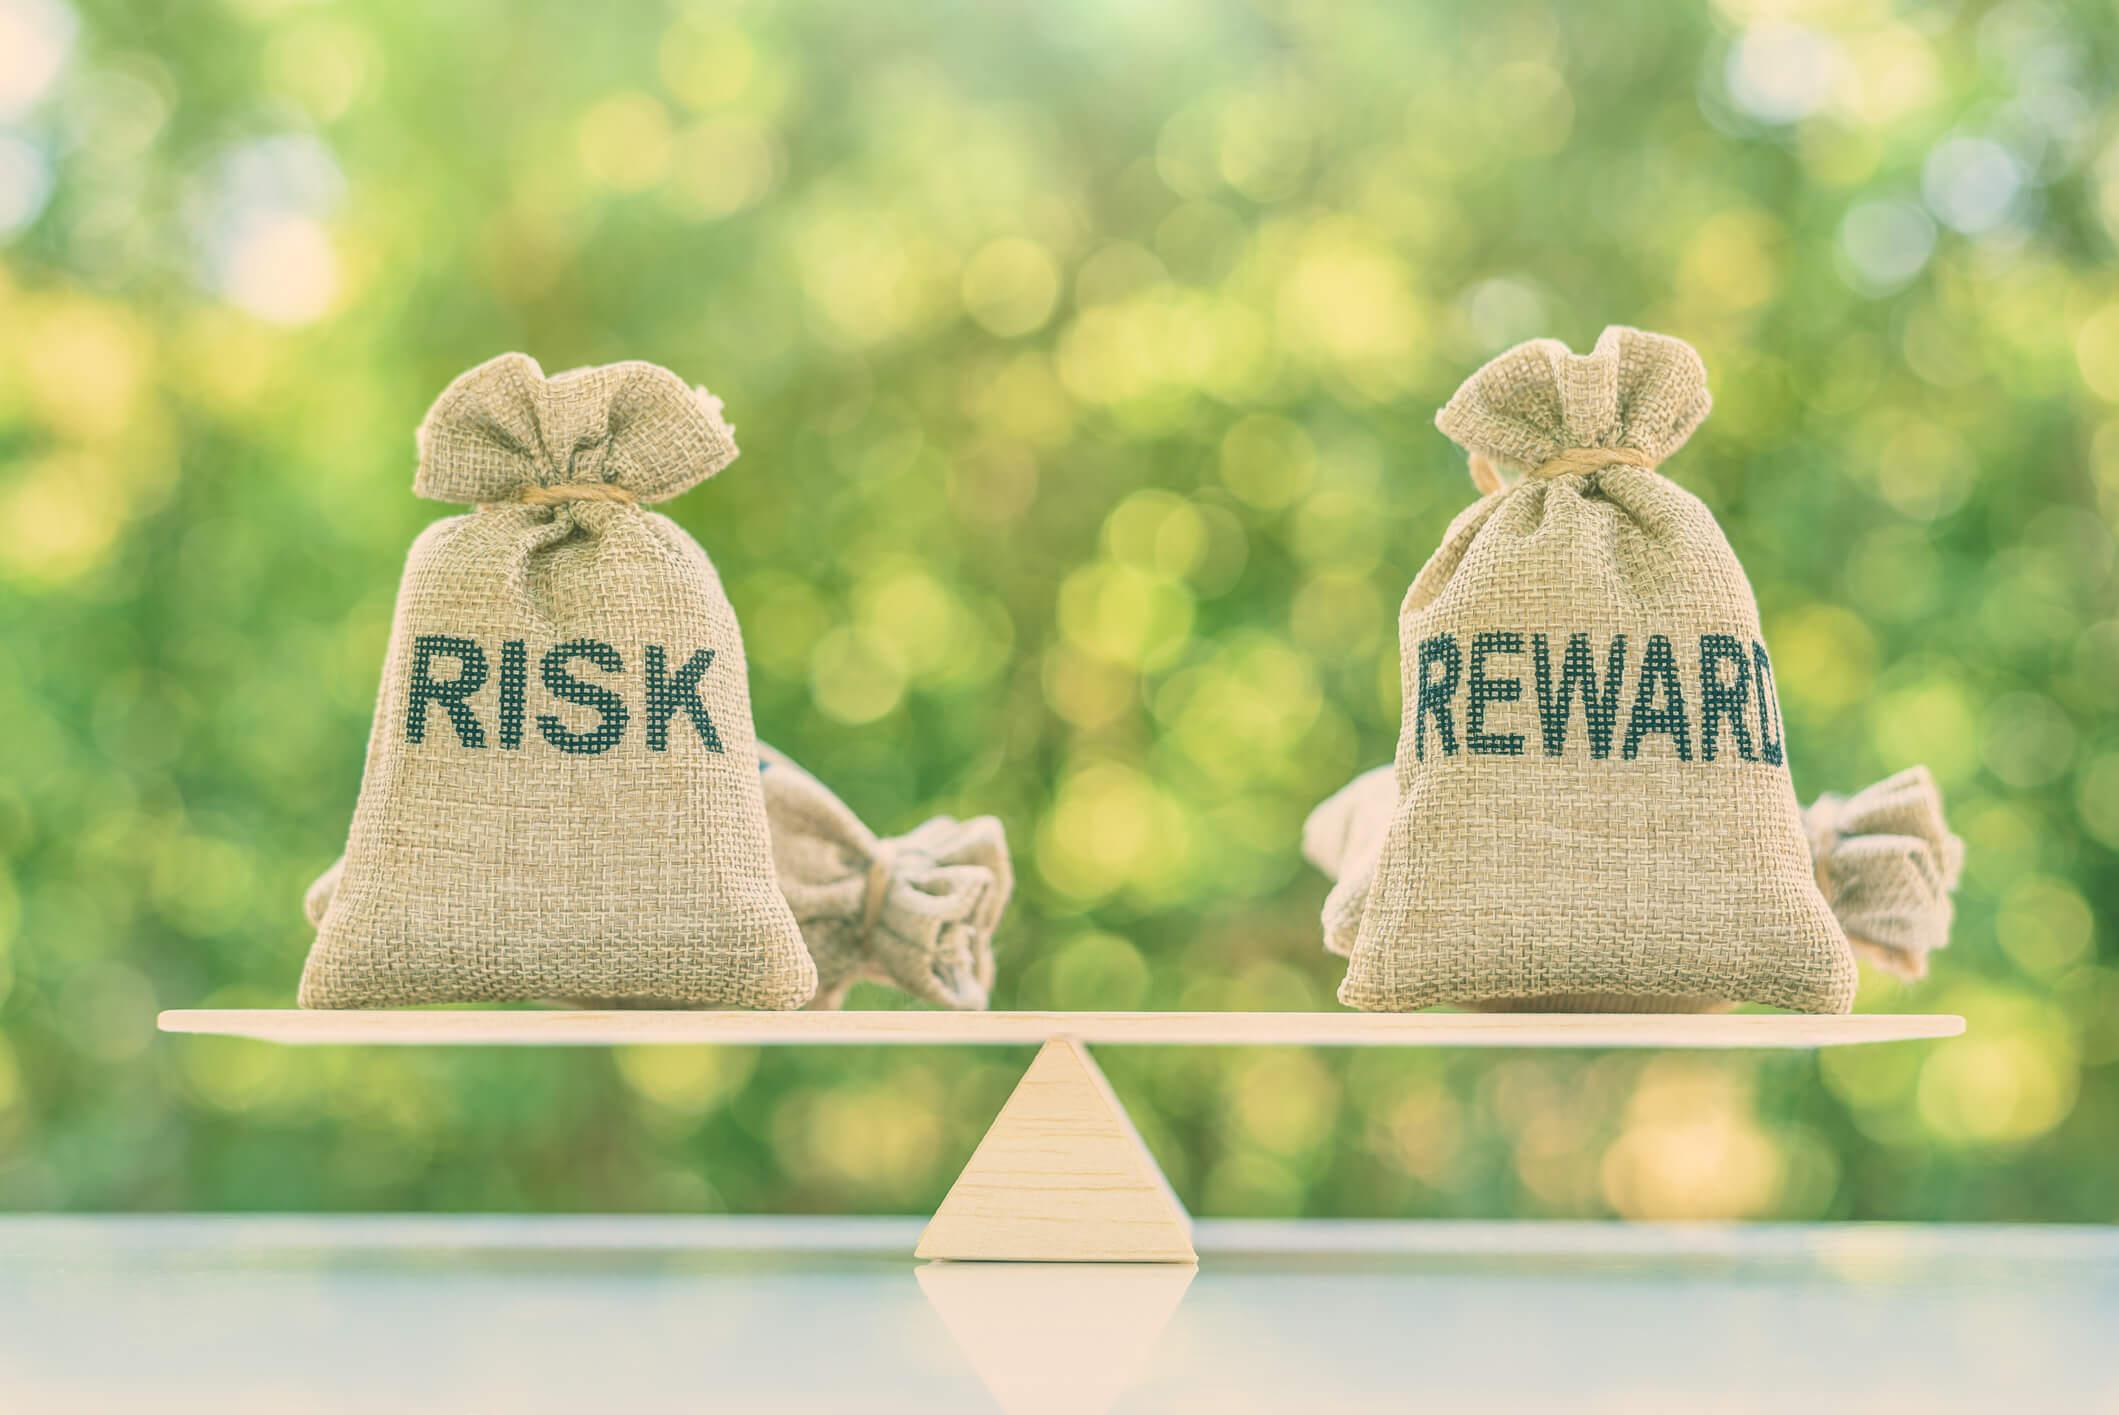 Risk Tolerance - Complete Controller